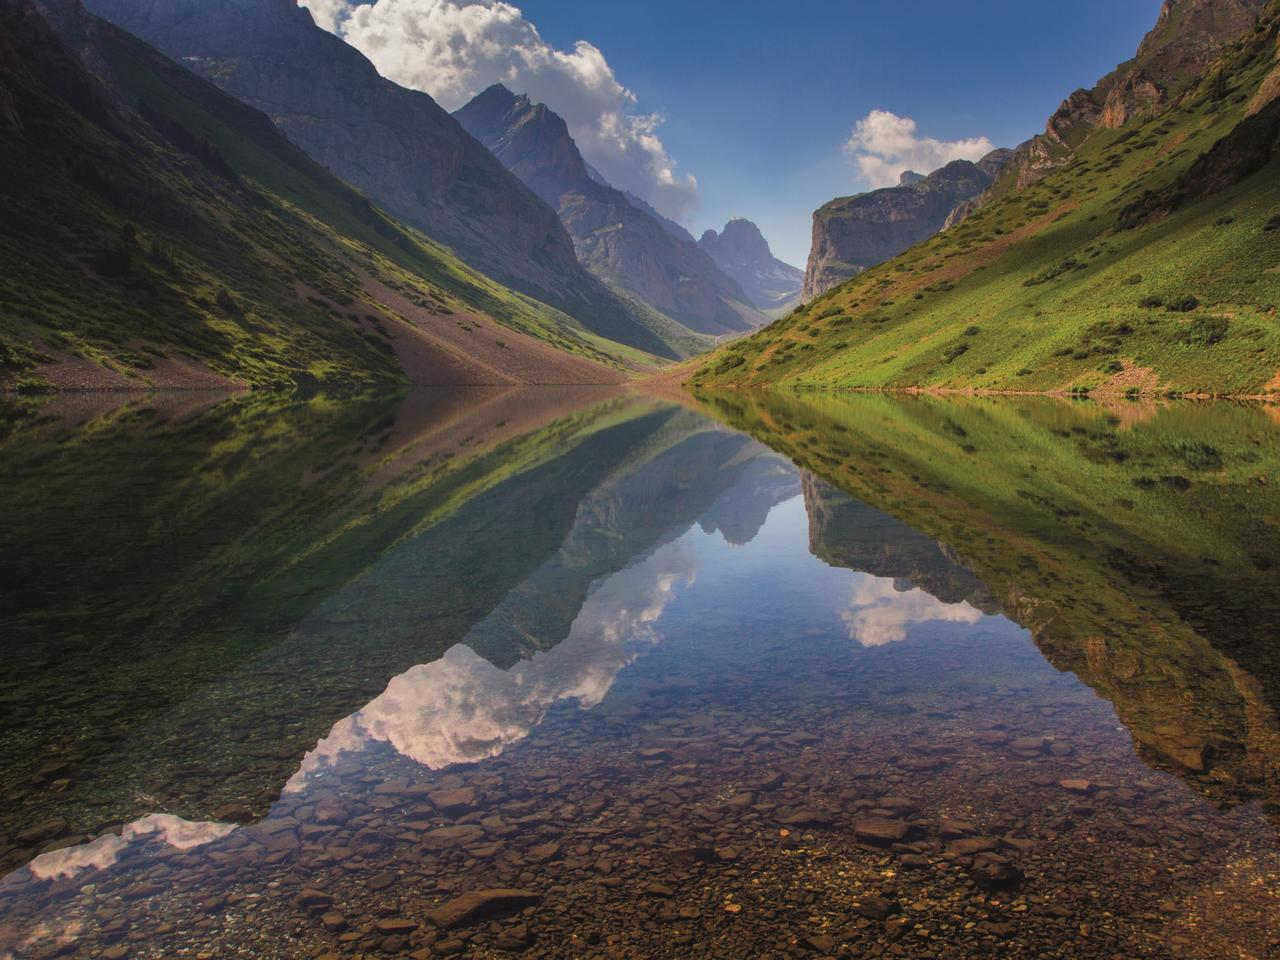 Köl-Tör lake is set amid supreme mountain terrain. Picture: Anton Agarkov / 500px